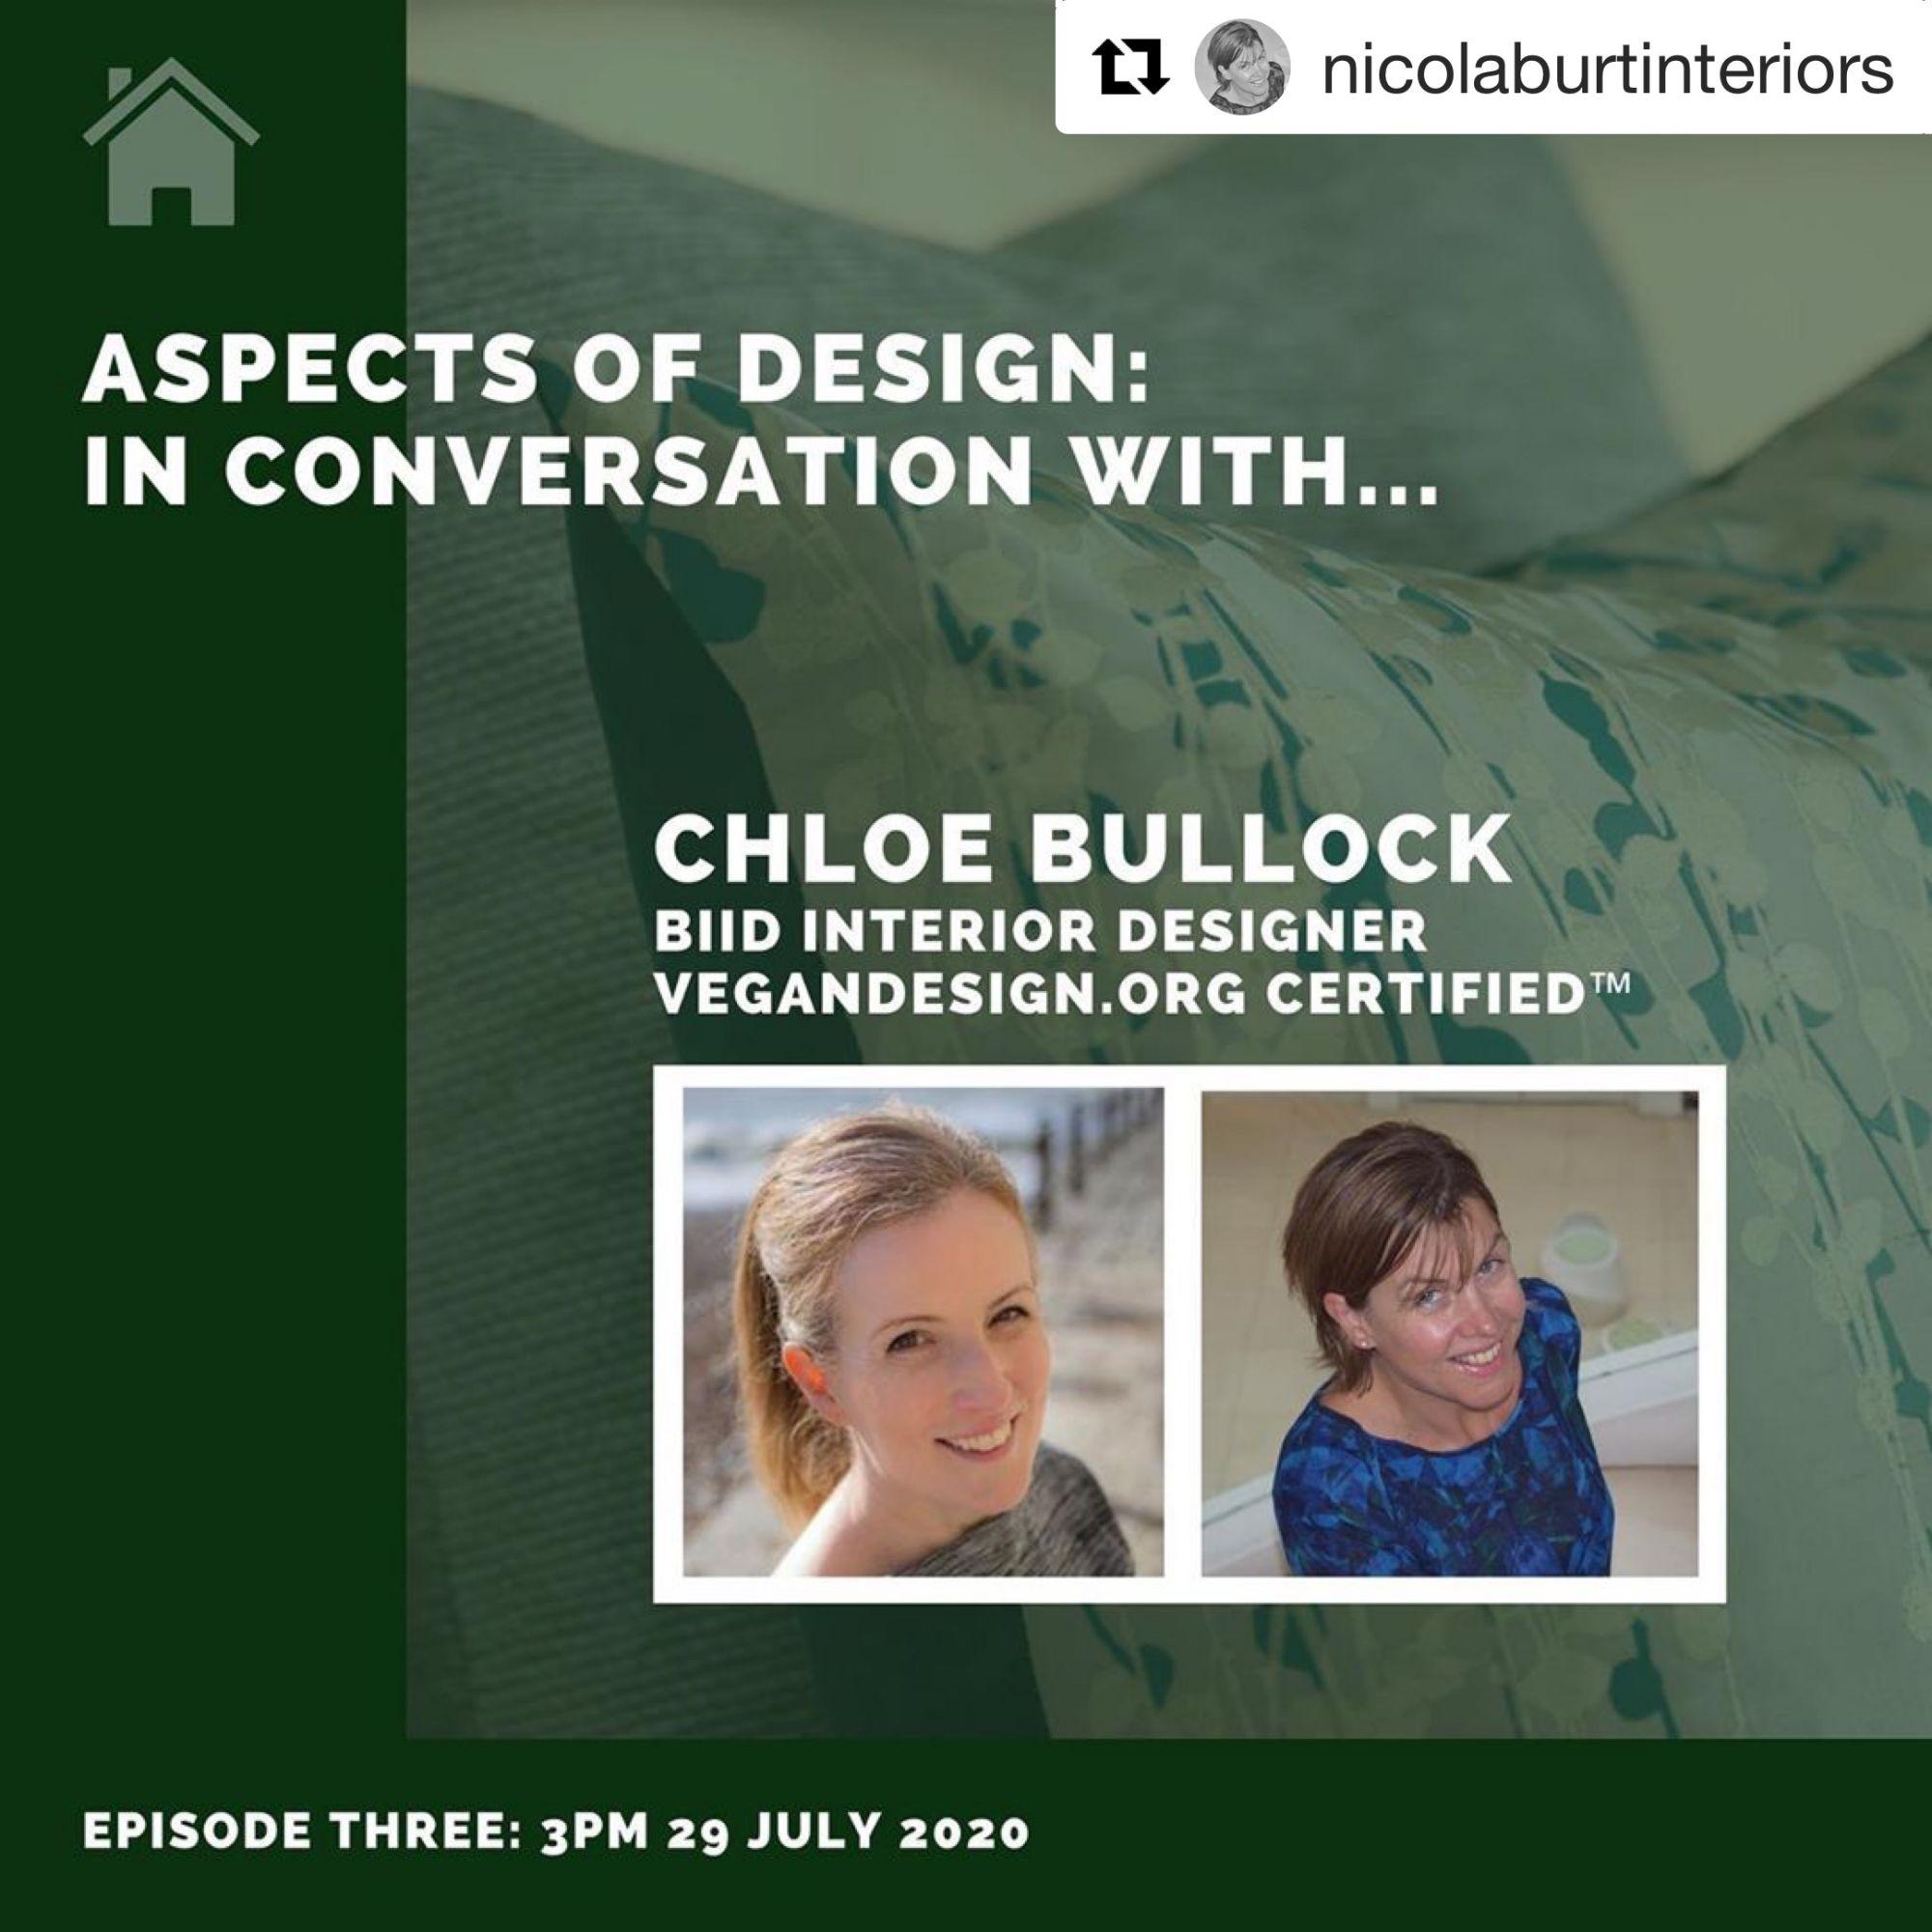 Nicola Burt Interiors interview on vegan and sustainable design